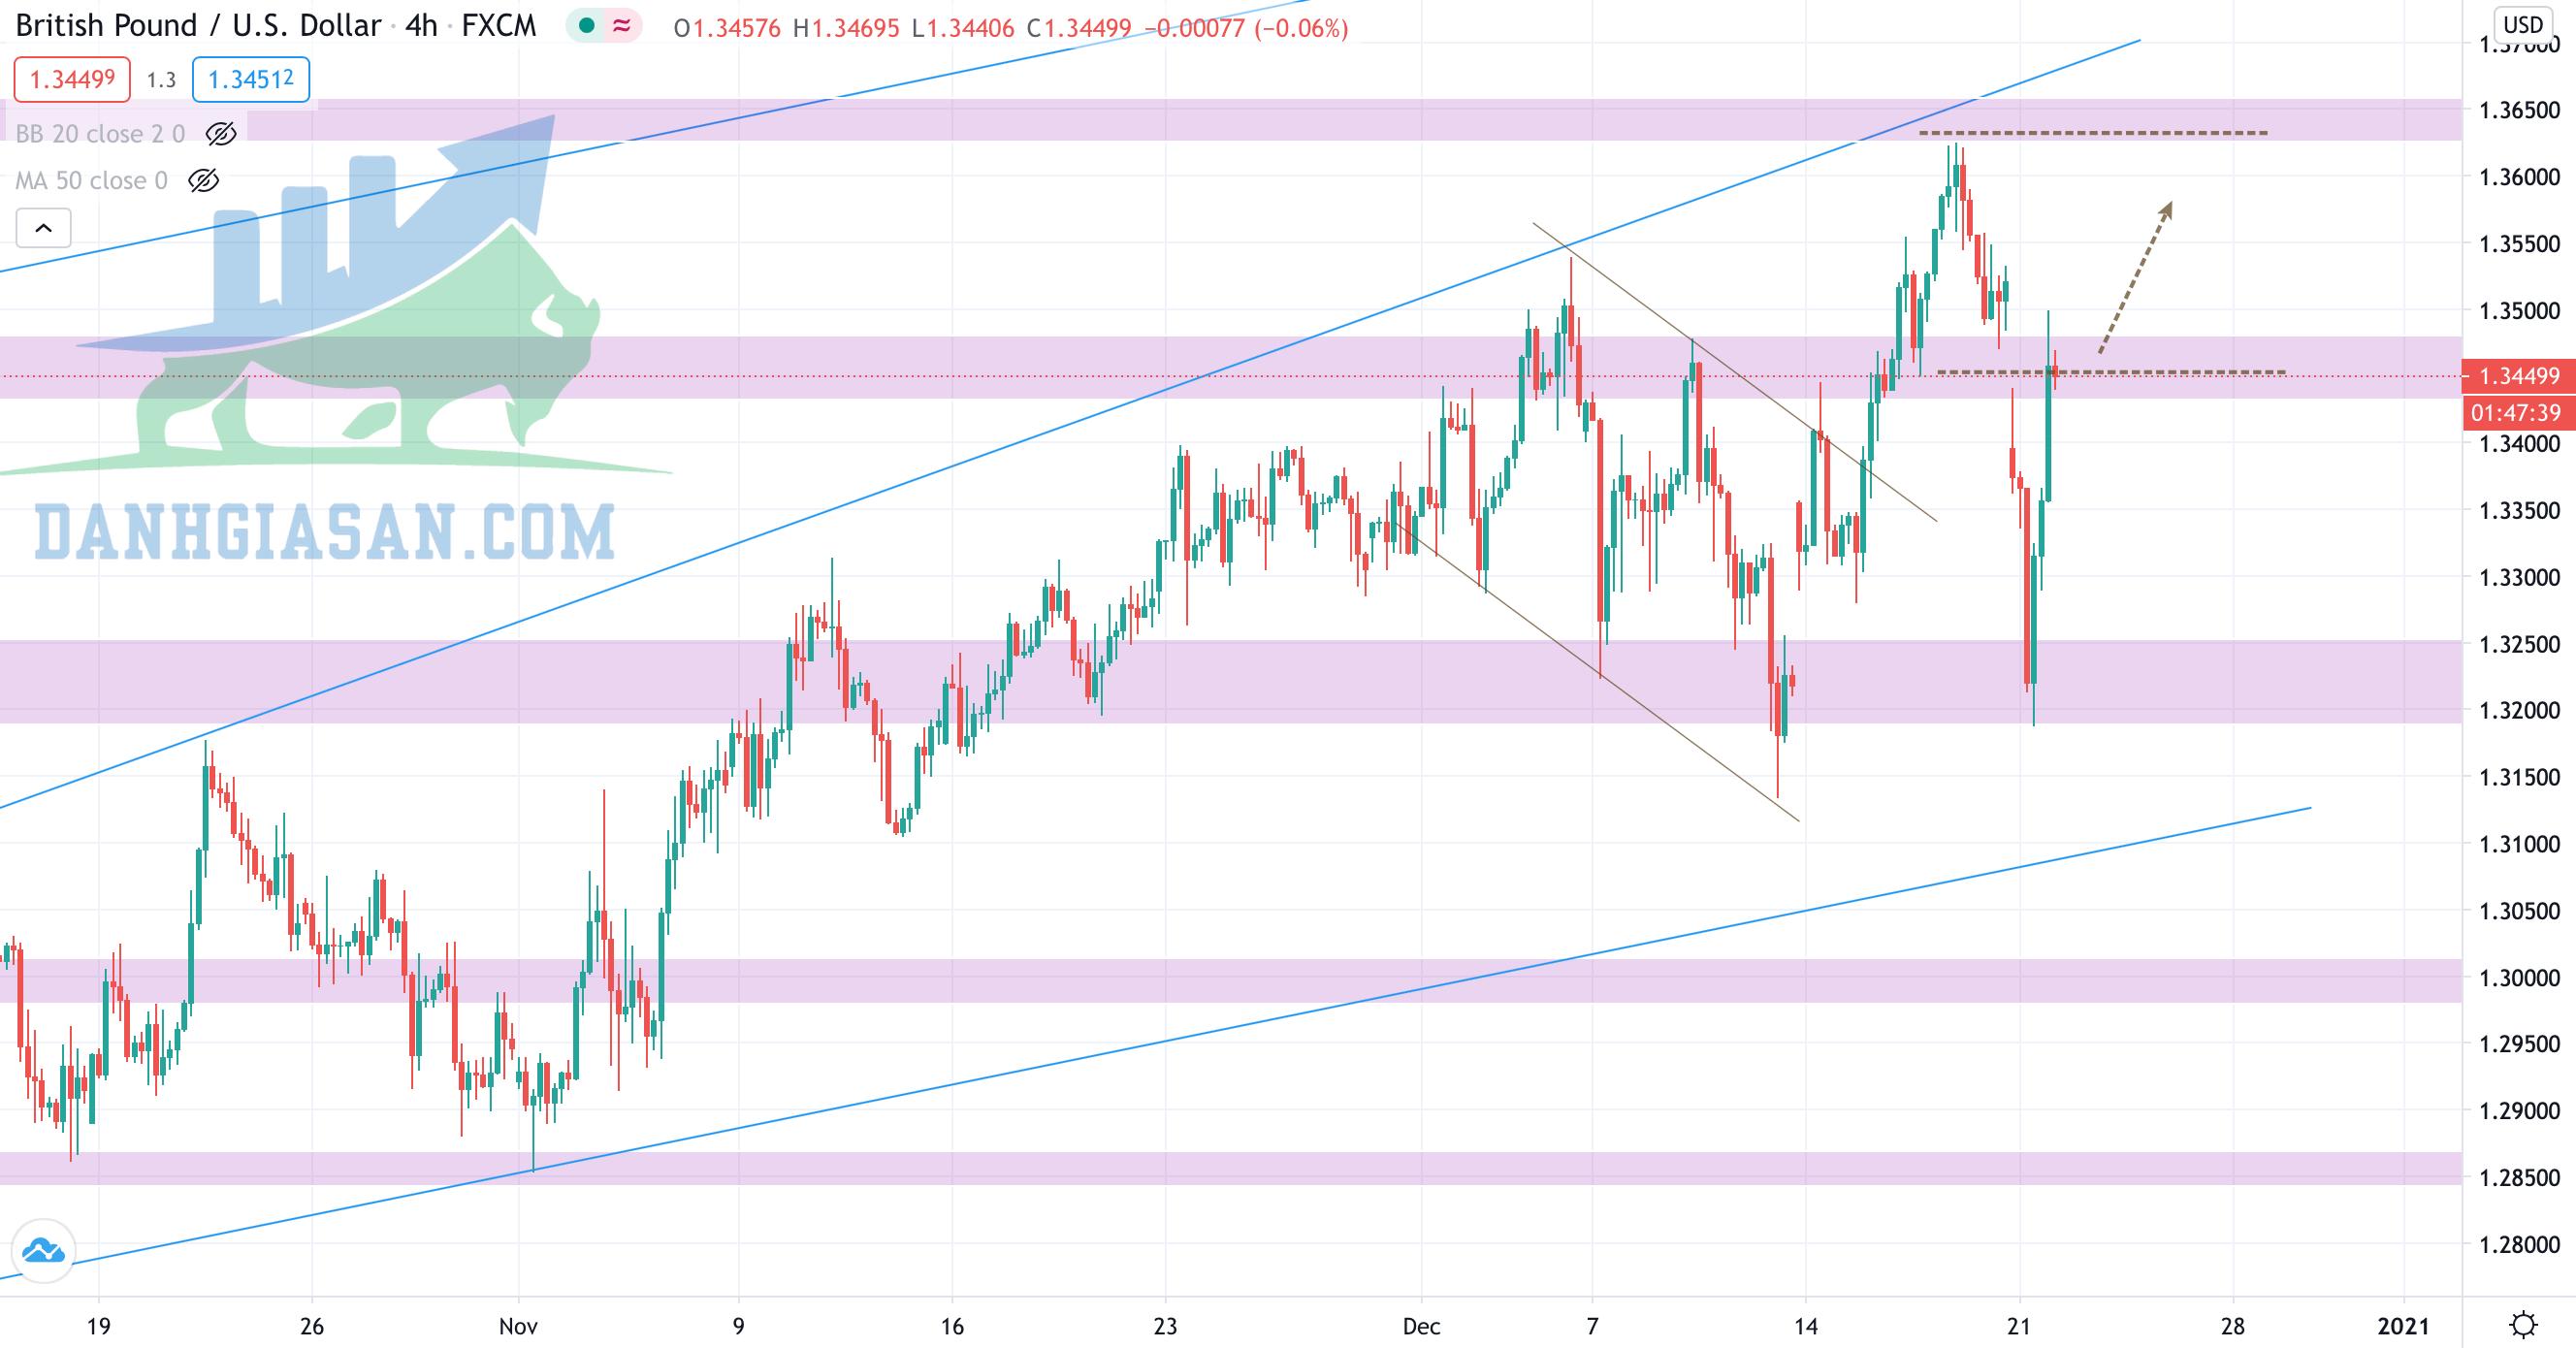 Phân tích Forex cặp GBP/USD